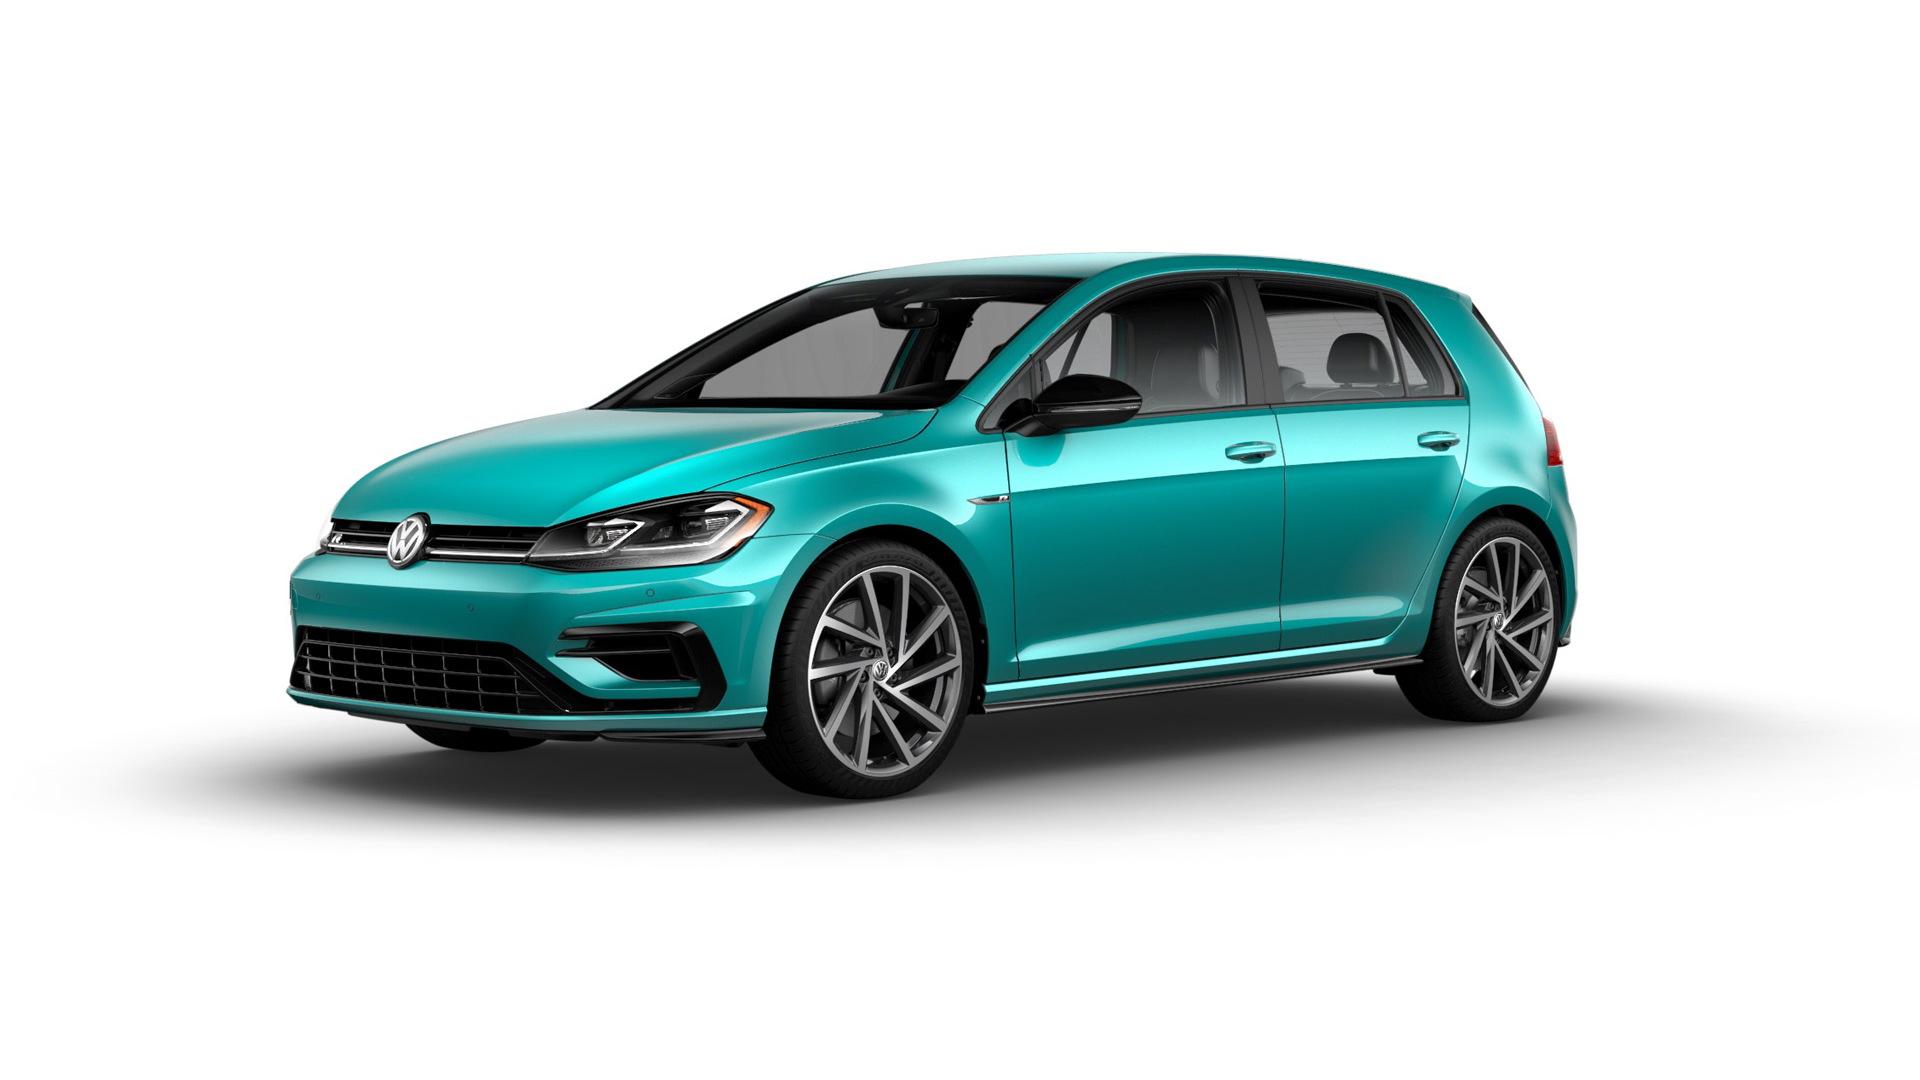 2019 Volkswagen Golf R featuring custom color from Spektrum Program